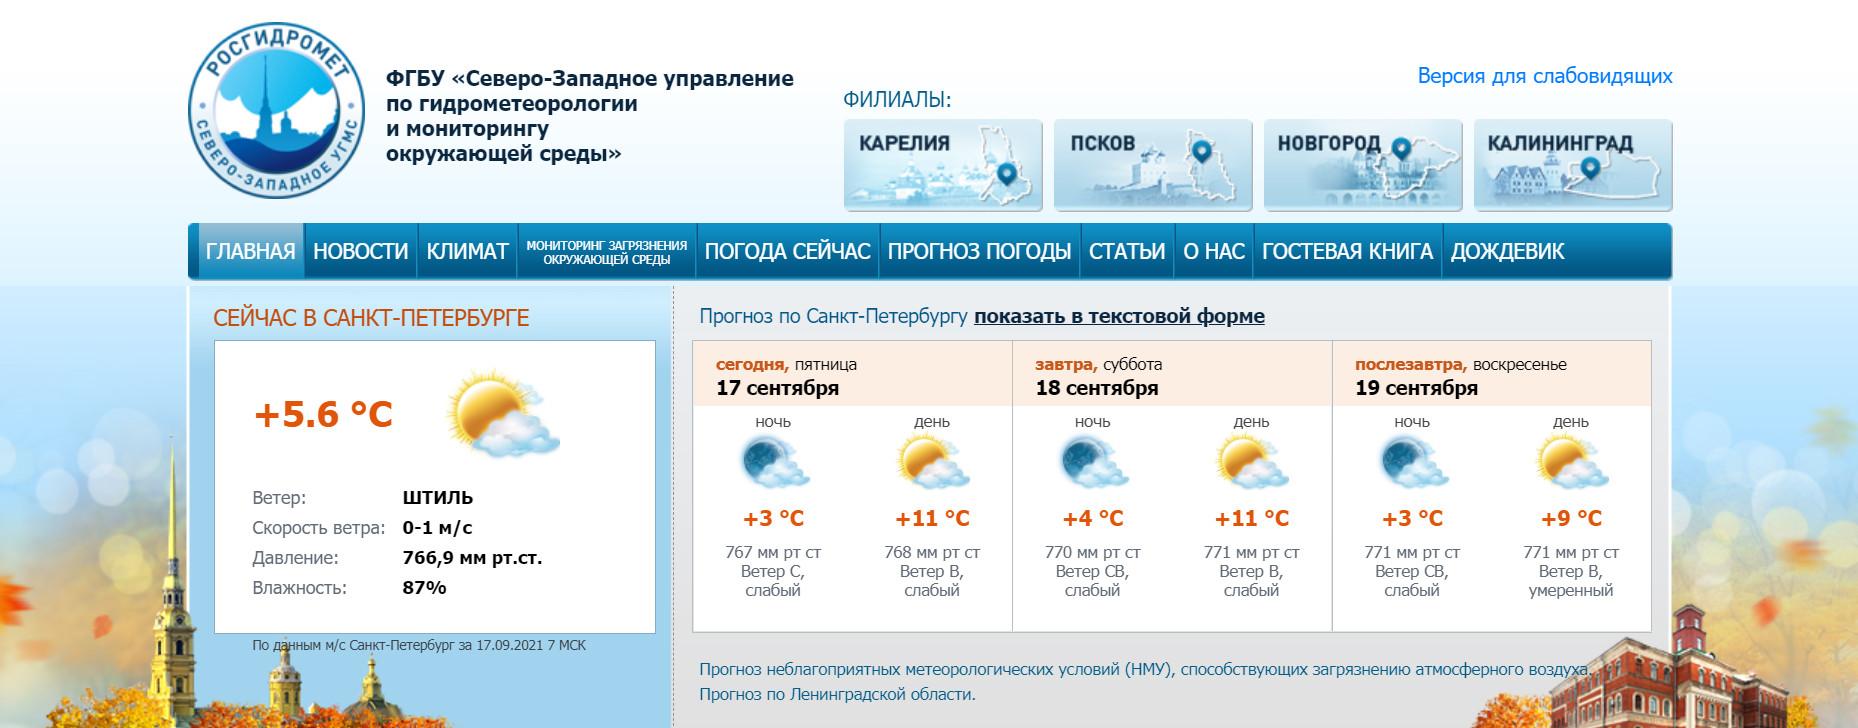 "Скриншот с <a href=""http://www.meteo.nw.ru/"" class=""io-leave-page _"" target=""_blank"">официального портала Северо-Западного УГМС</a>"